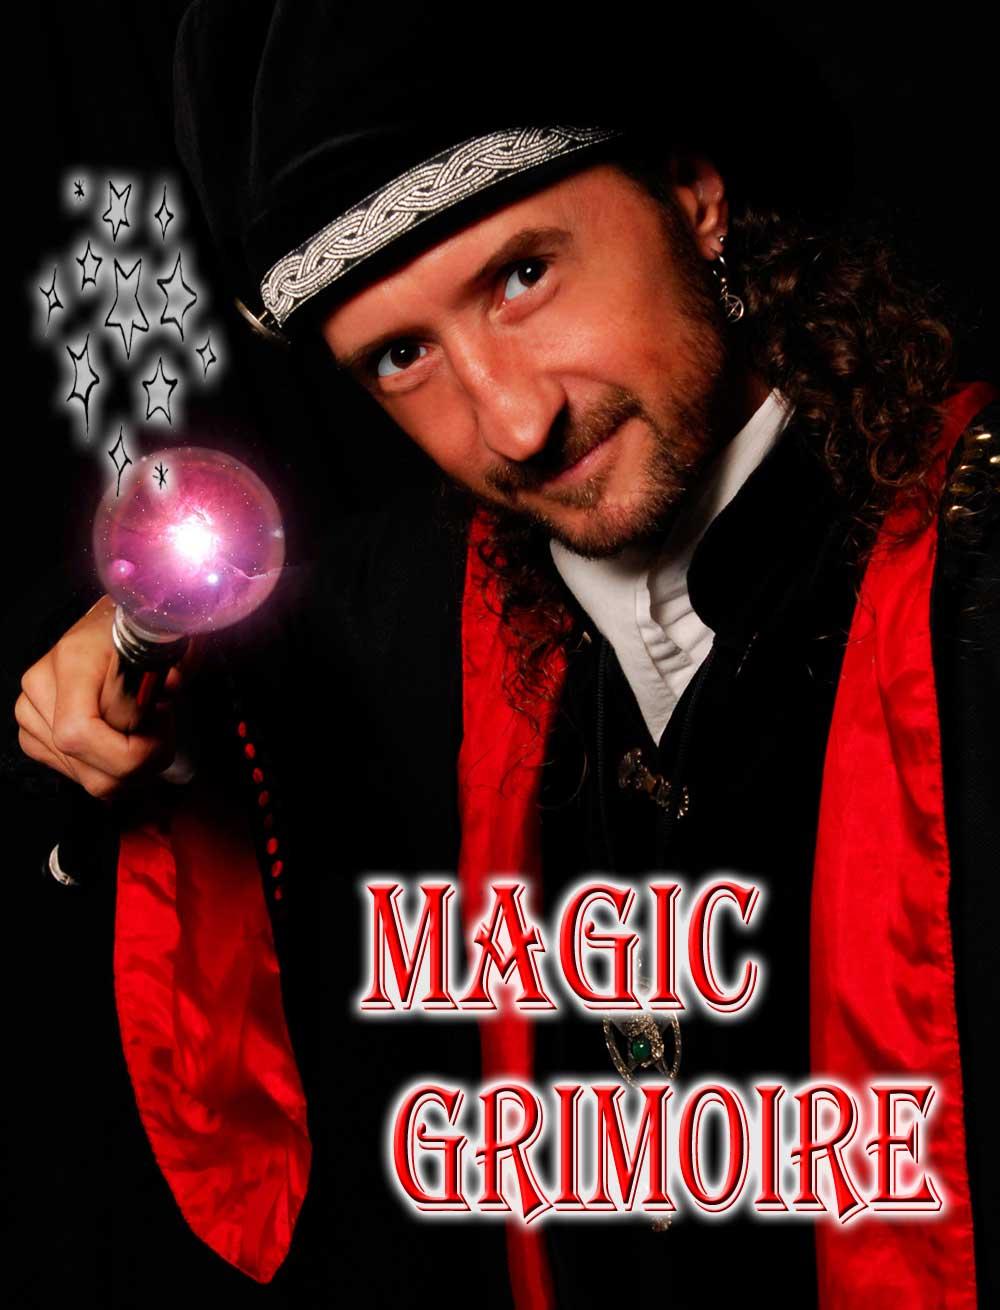 Loran magician illusionist, Magic Grimoire magic shows